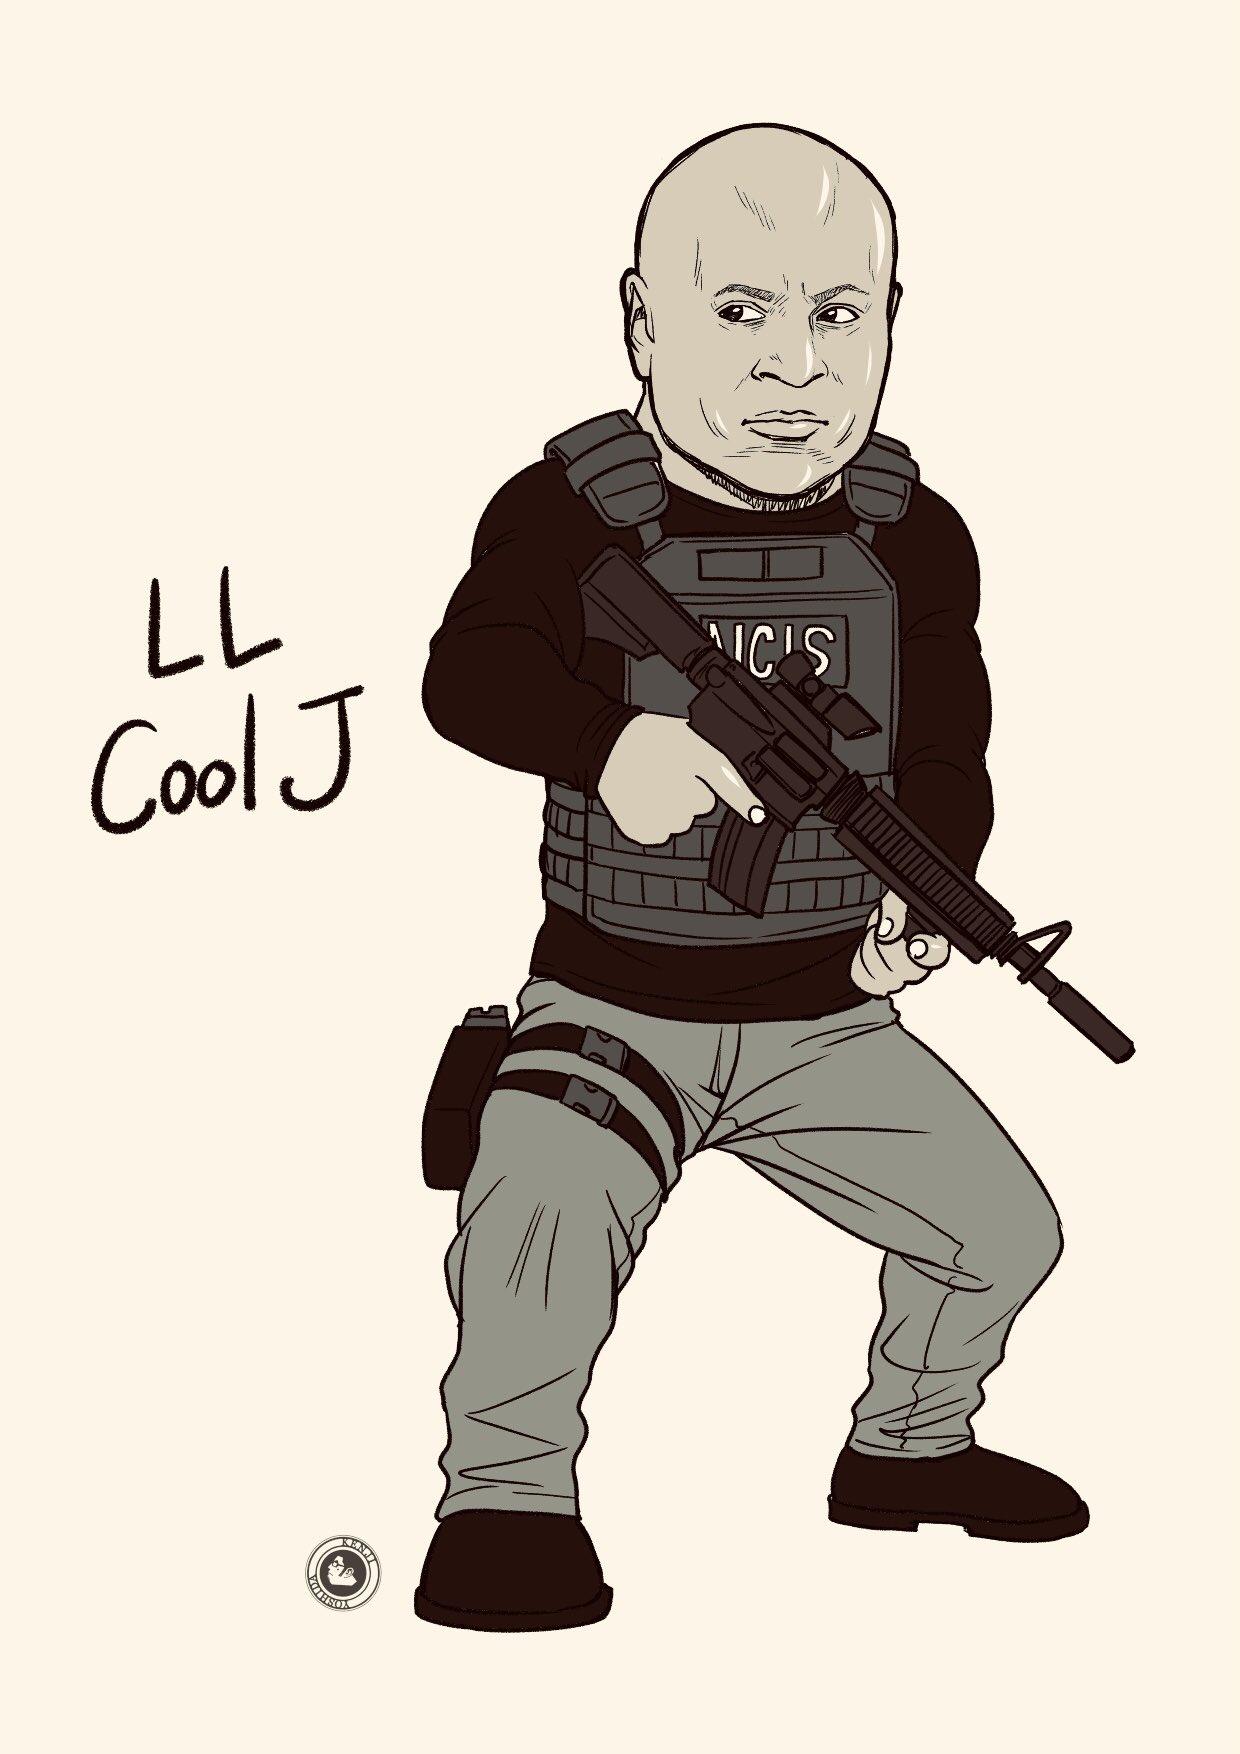 LL     J              Happy Birthday  LL Cool J